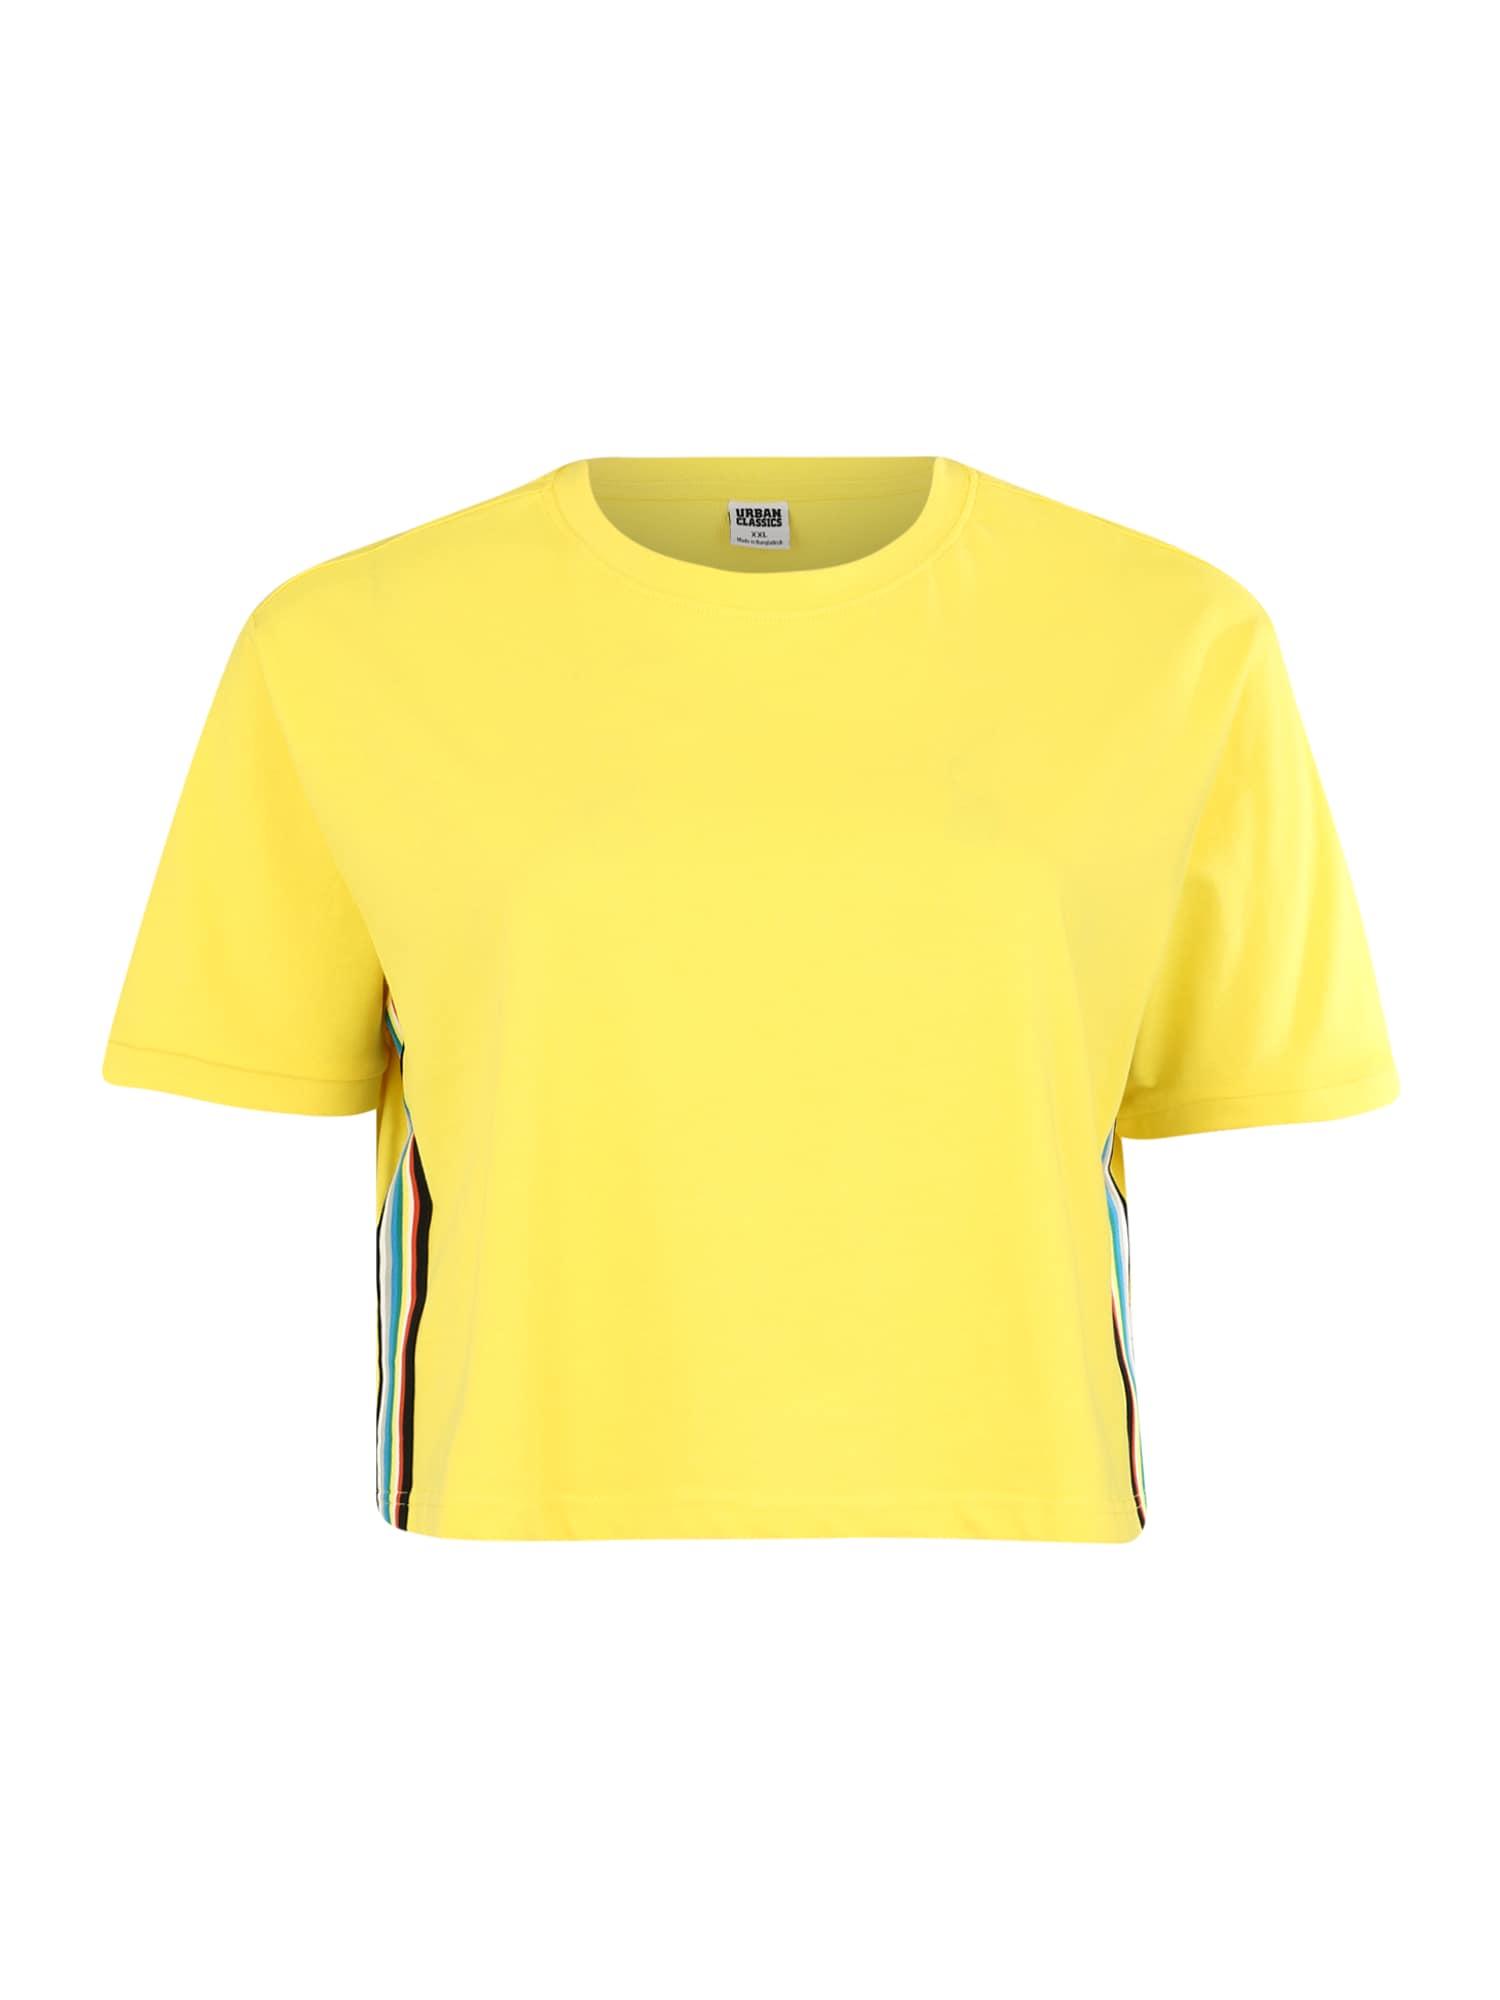 Tričko žlutá mix barev Urban Classics Curvy